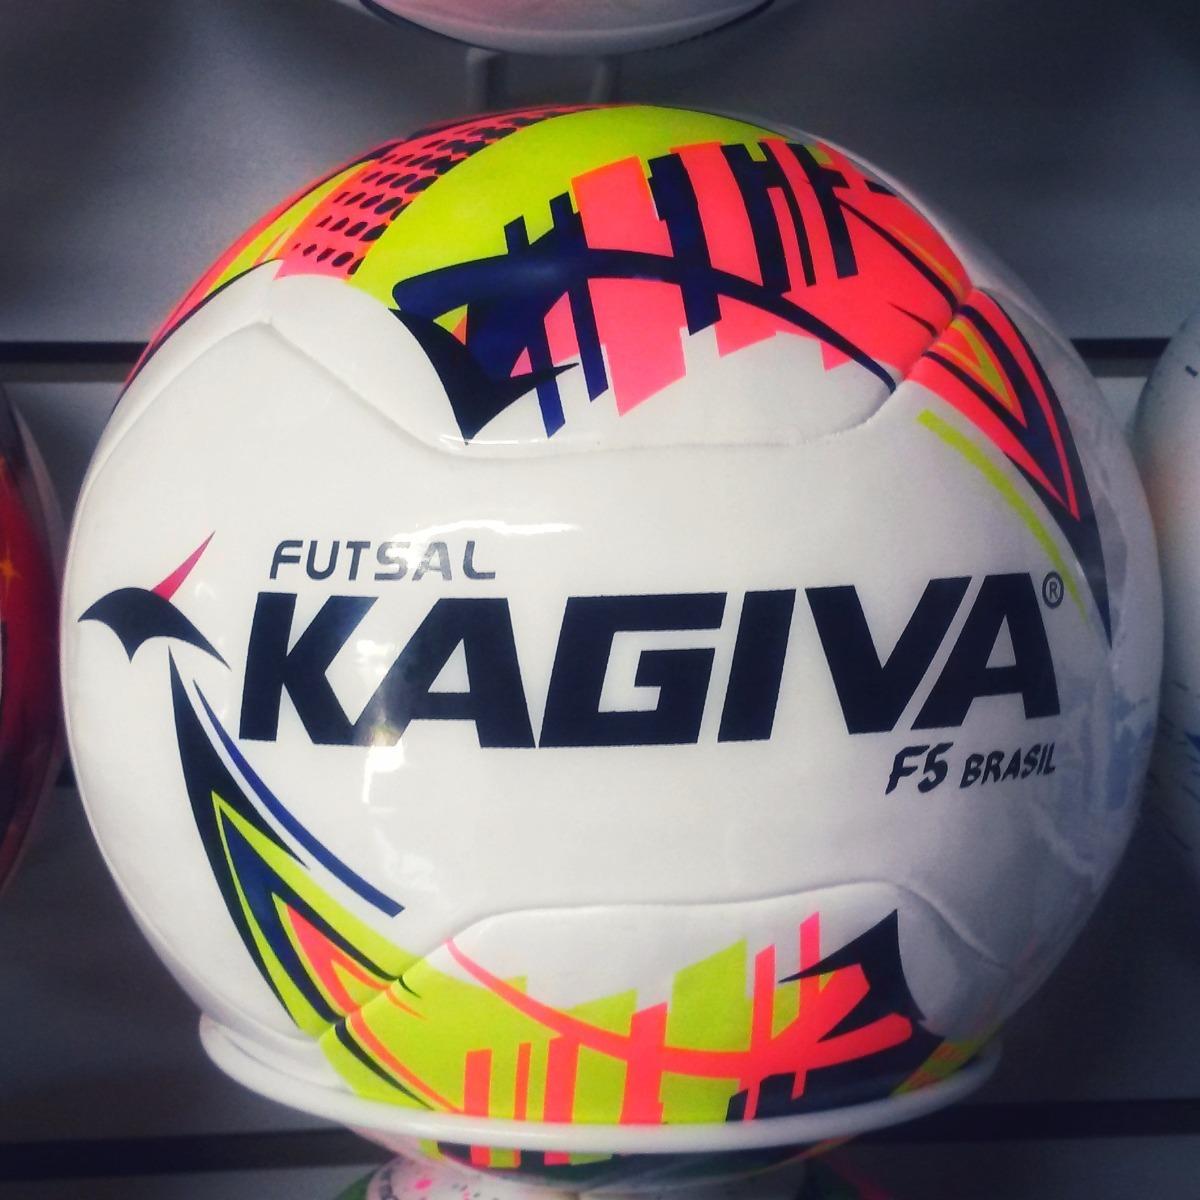 de6fc17450 2 Bolas Futsal Kagiva F5 Brasil Pró Oficial Liga Nacional - R  230 ...